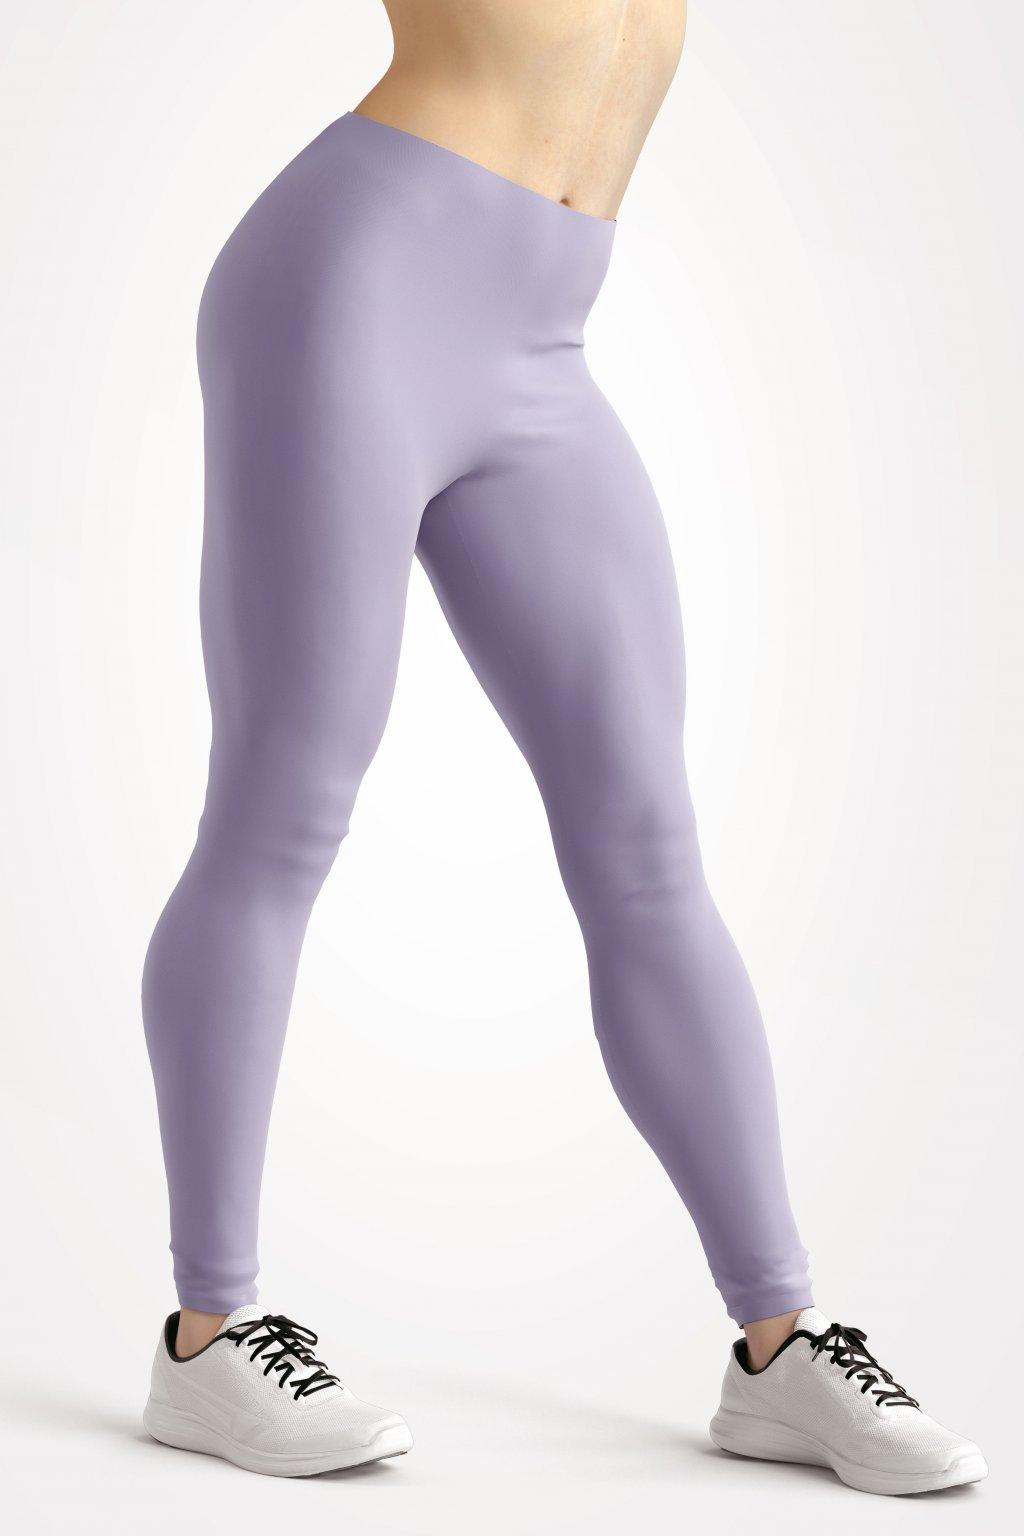 leggings levander pink essentials front side by utopy